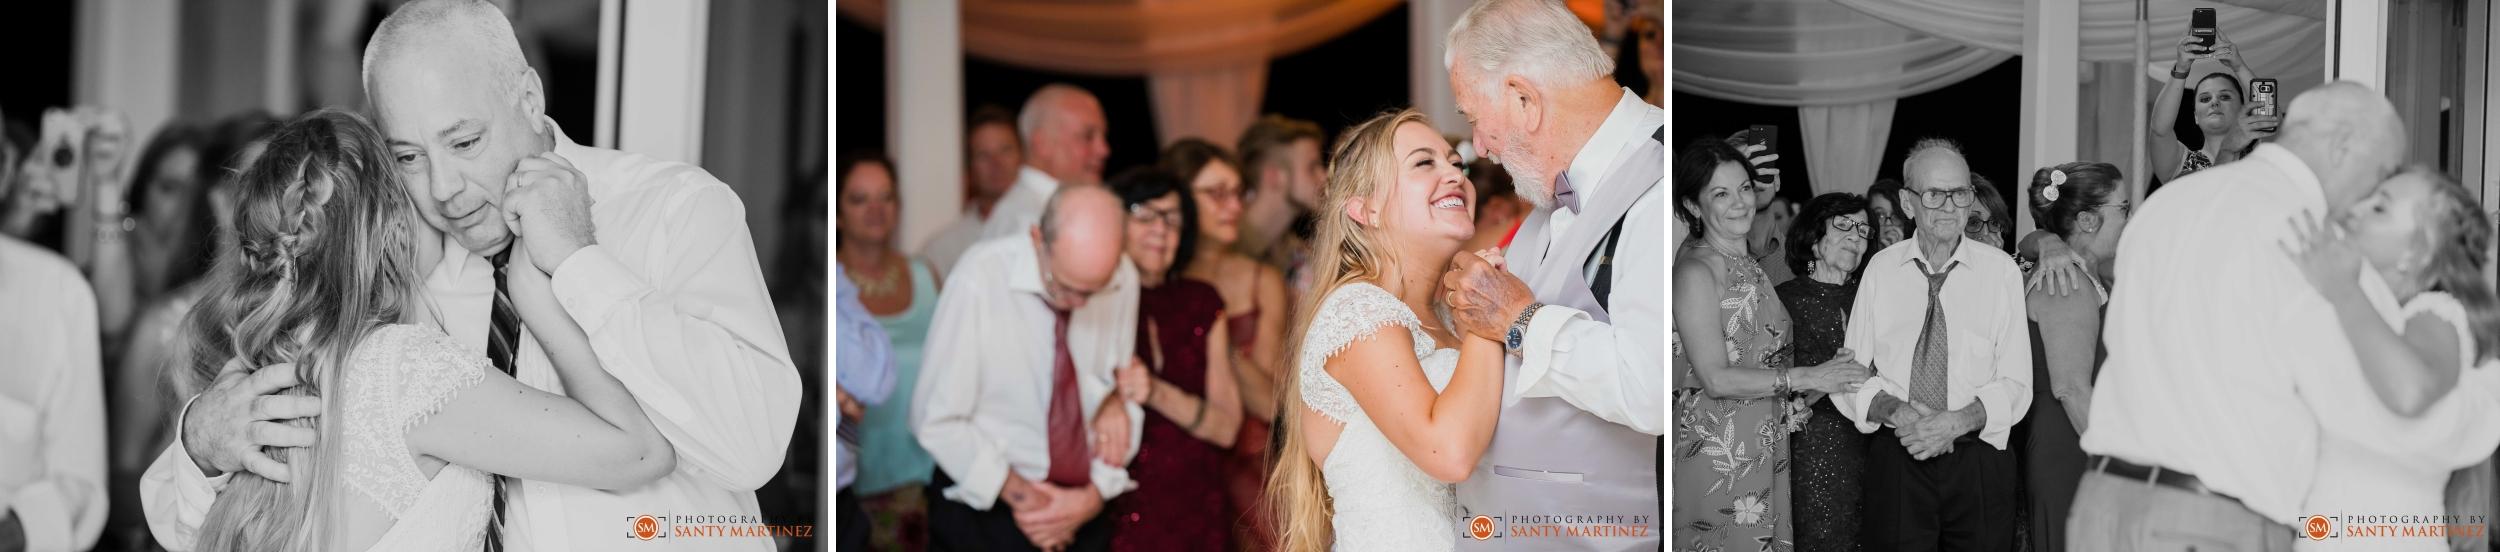 Wedding - Seagate Beach Club - Hotel - Delray Beach - Santy Martinez Photography 14.jpg